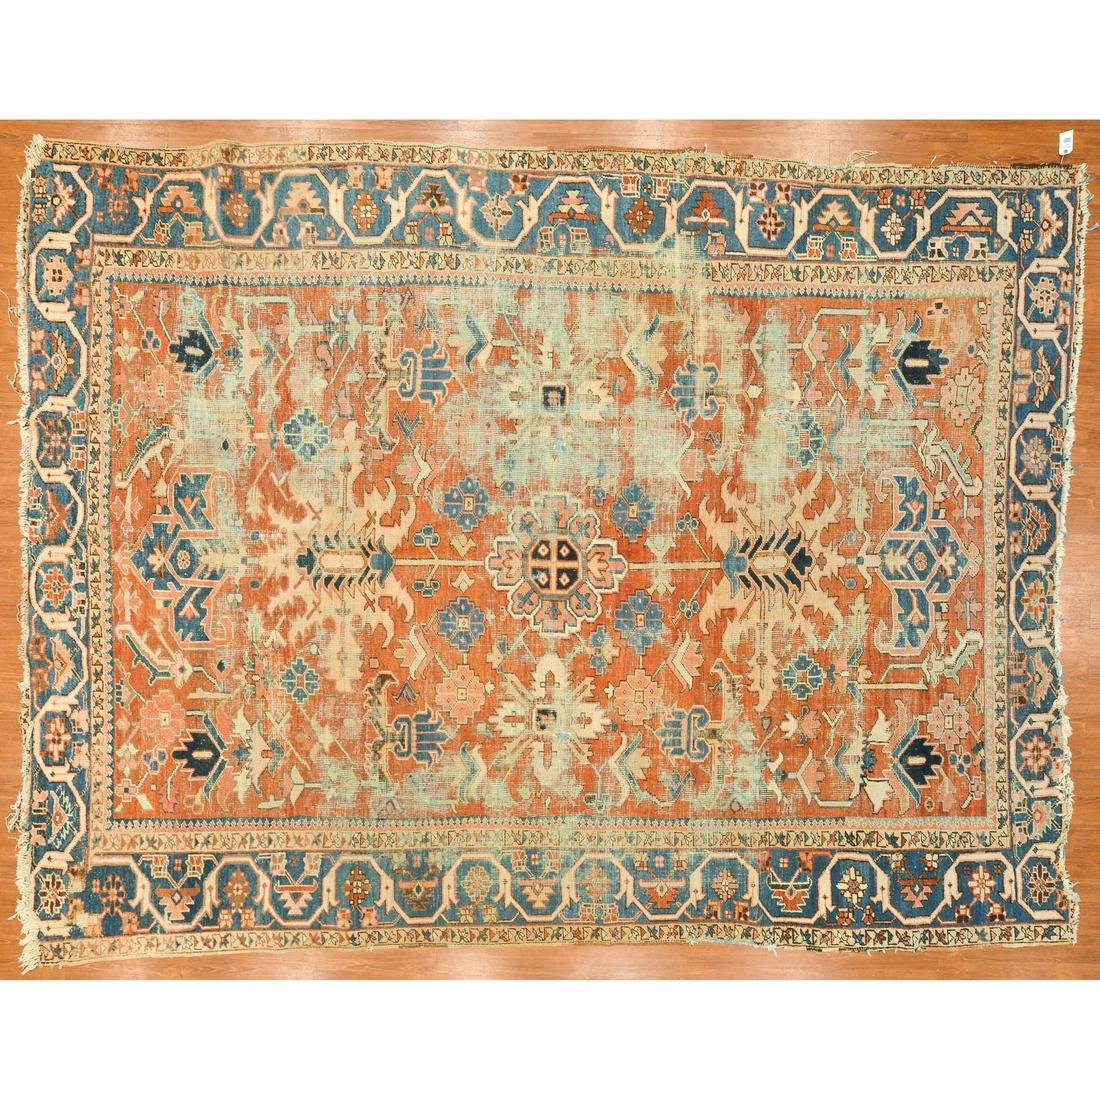 Antique Serapi Rug, Persia, 9.6 x 12.5